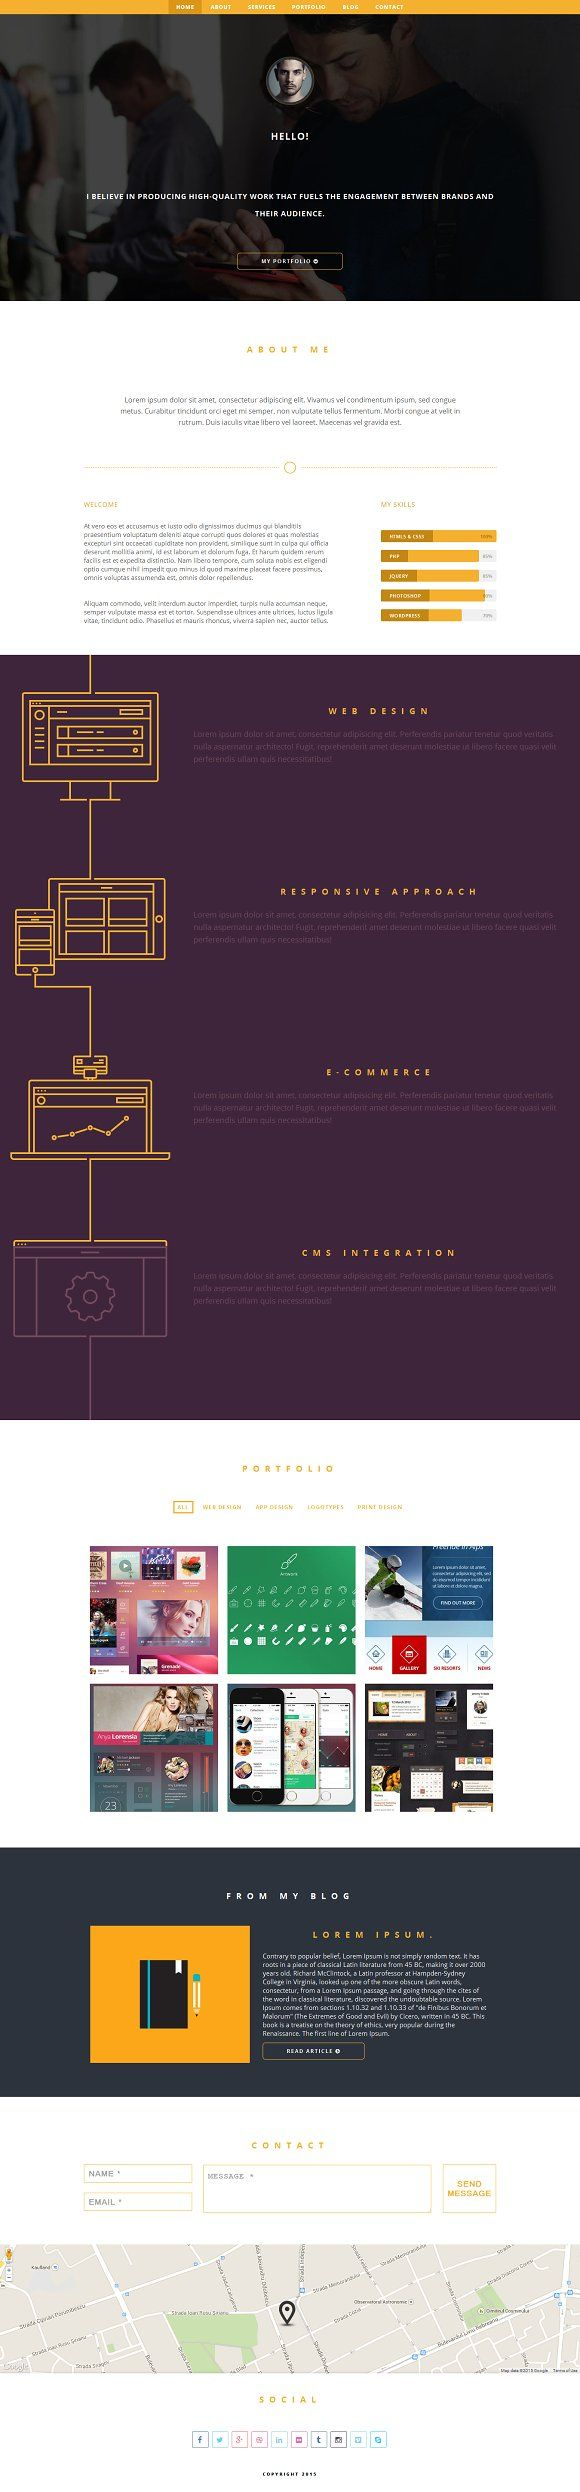 Dafreelancer Web template design, Css templates, Css